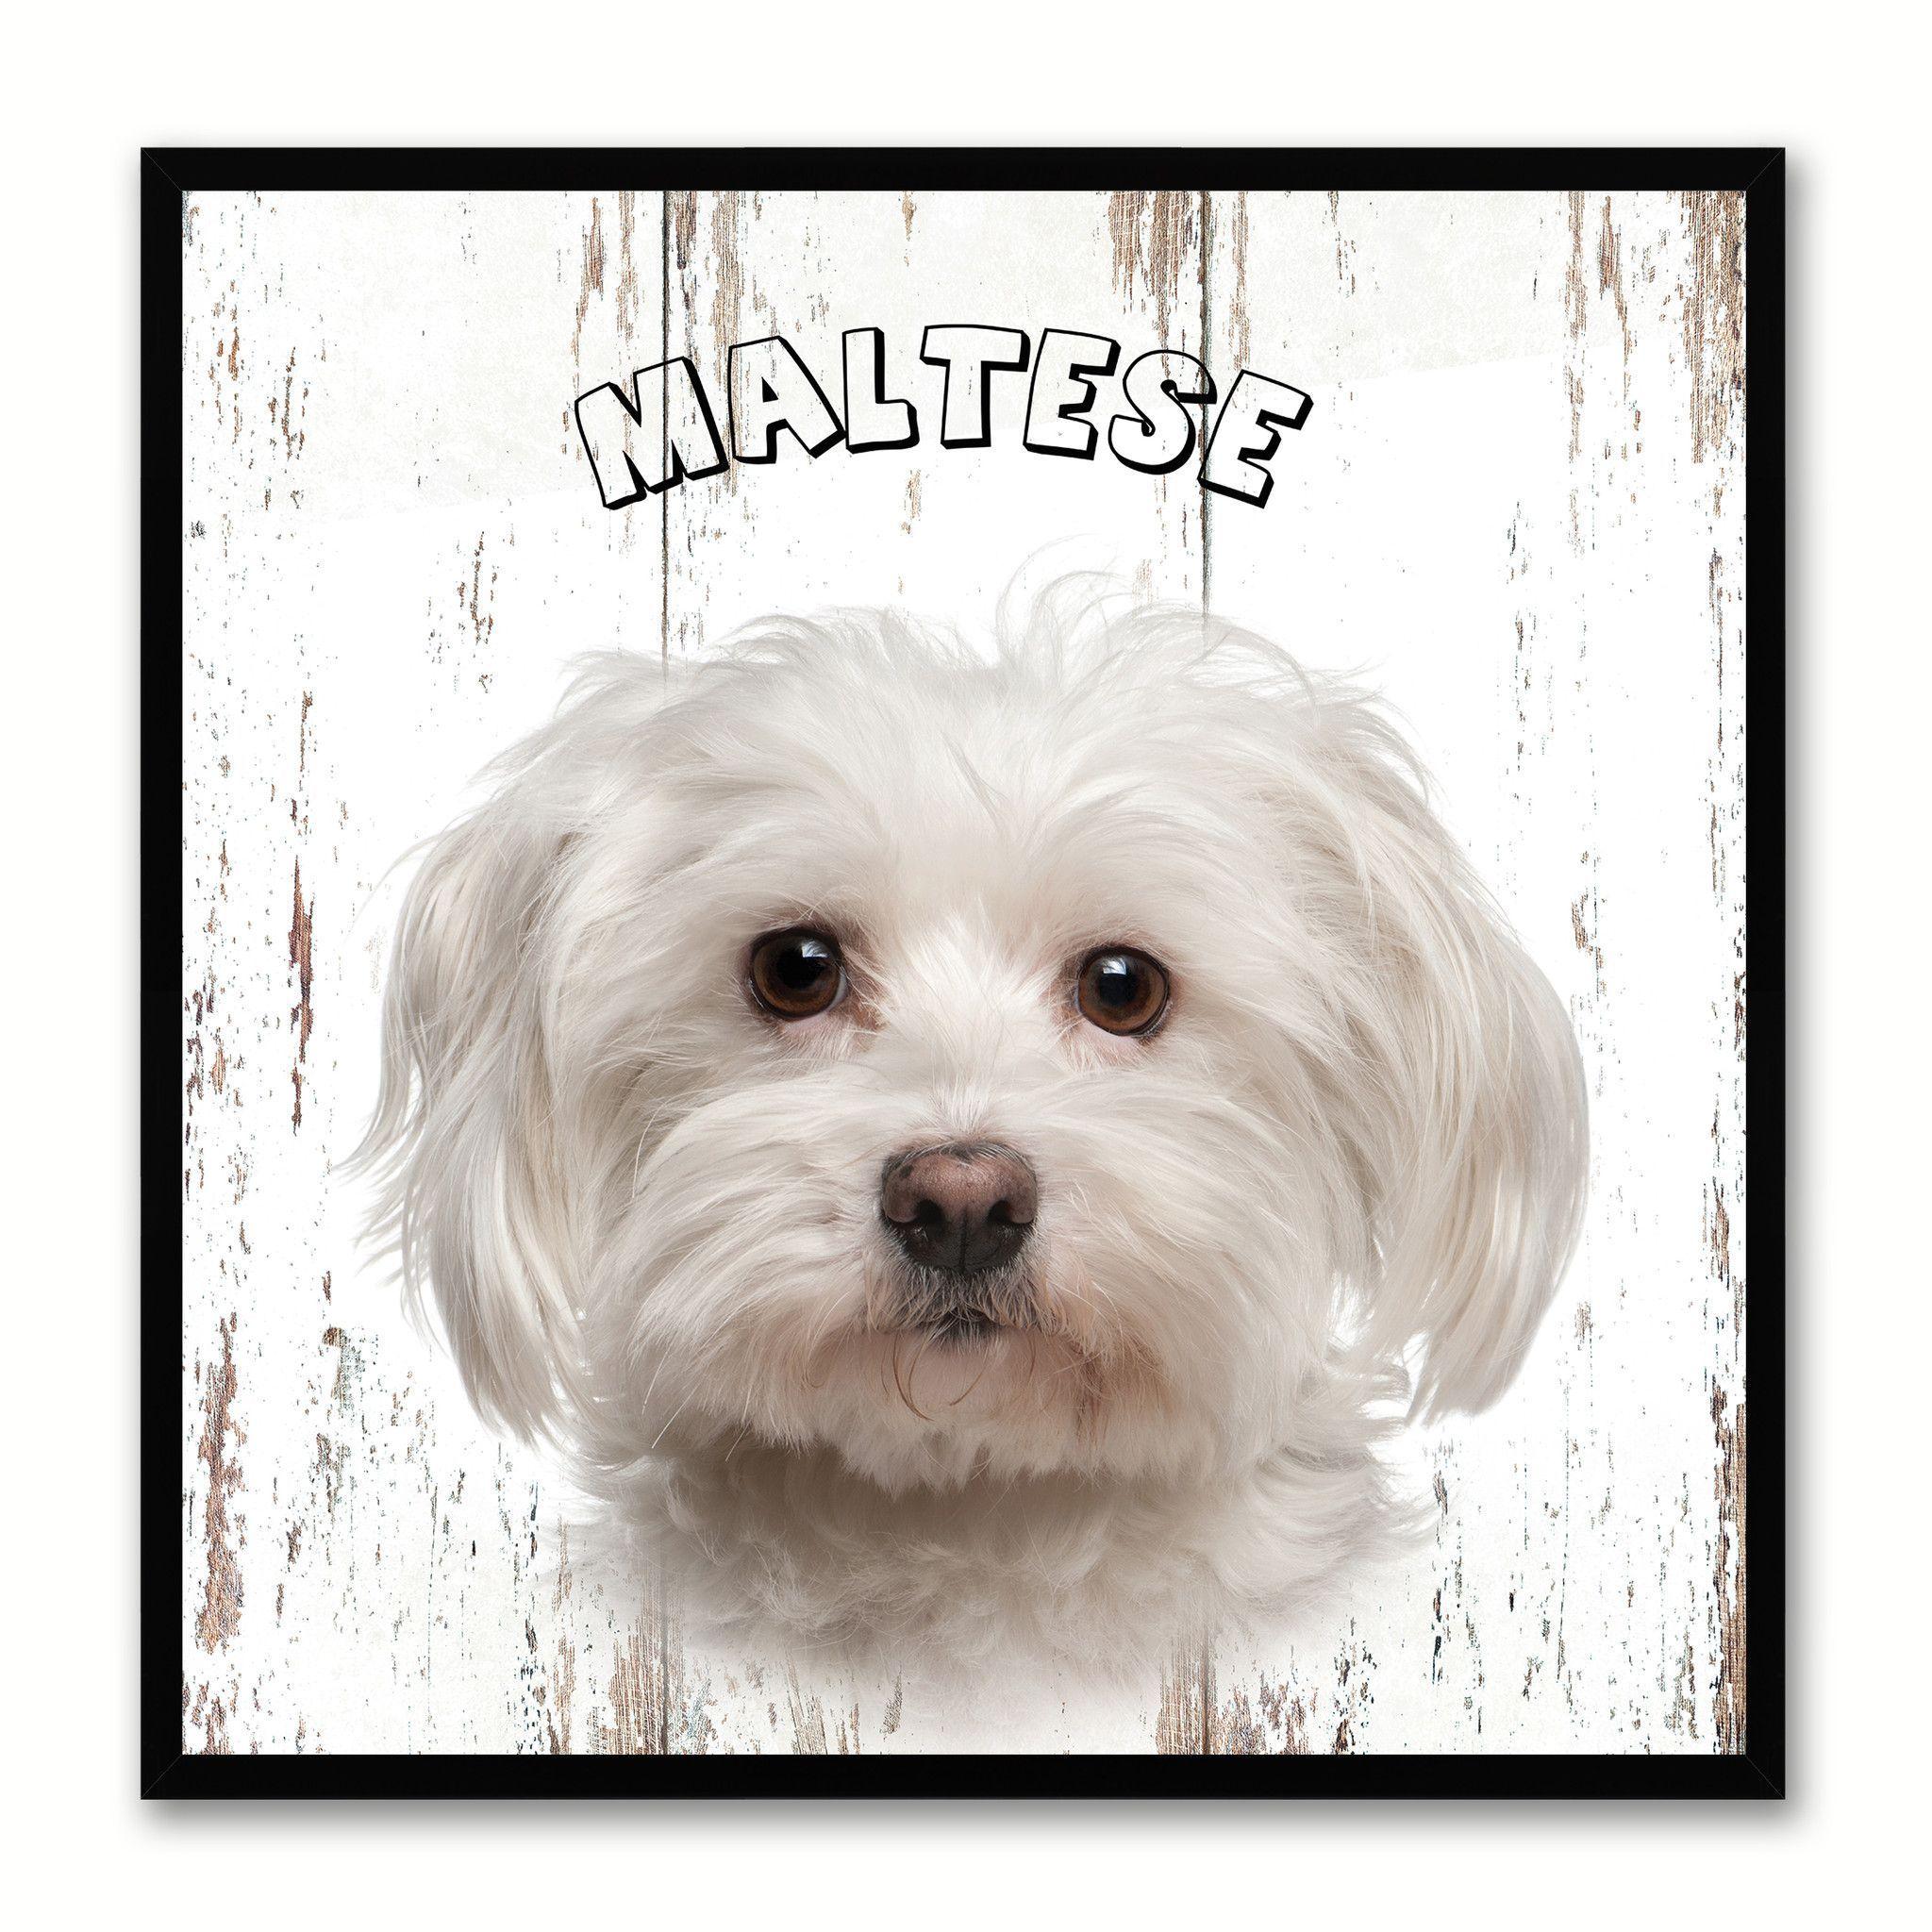 Maltese Dog Canvas Print Picture Frame Gift Home Decor Wall Art Decoratio Maltese Dog Canvas Print Picture Frame Gift Home Dec Maltese Dogs Dog Canvas Maltese